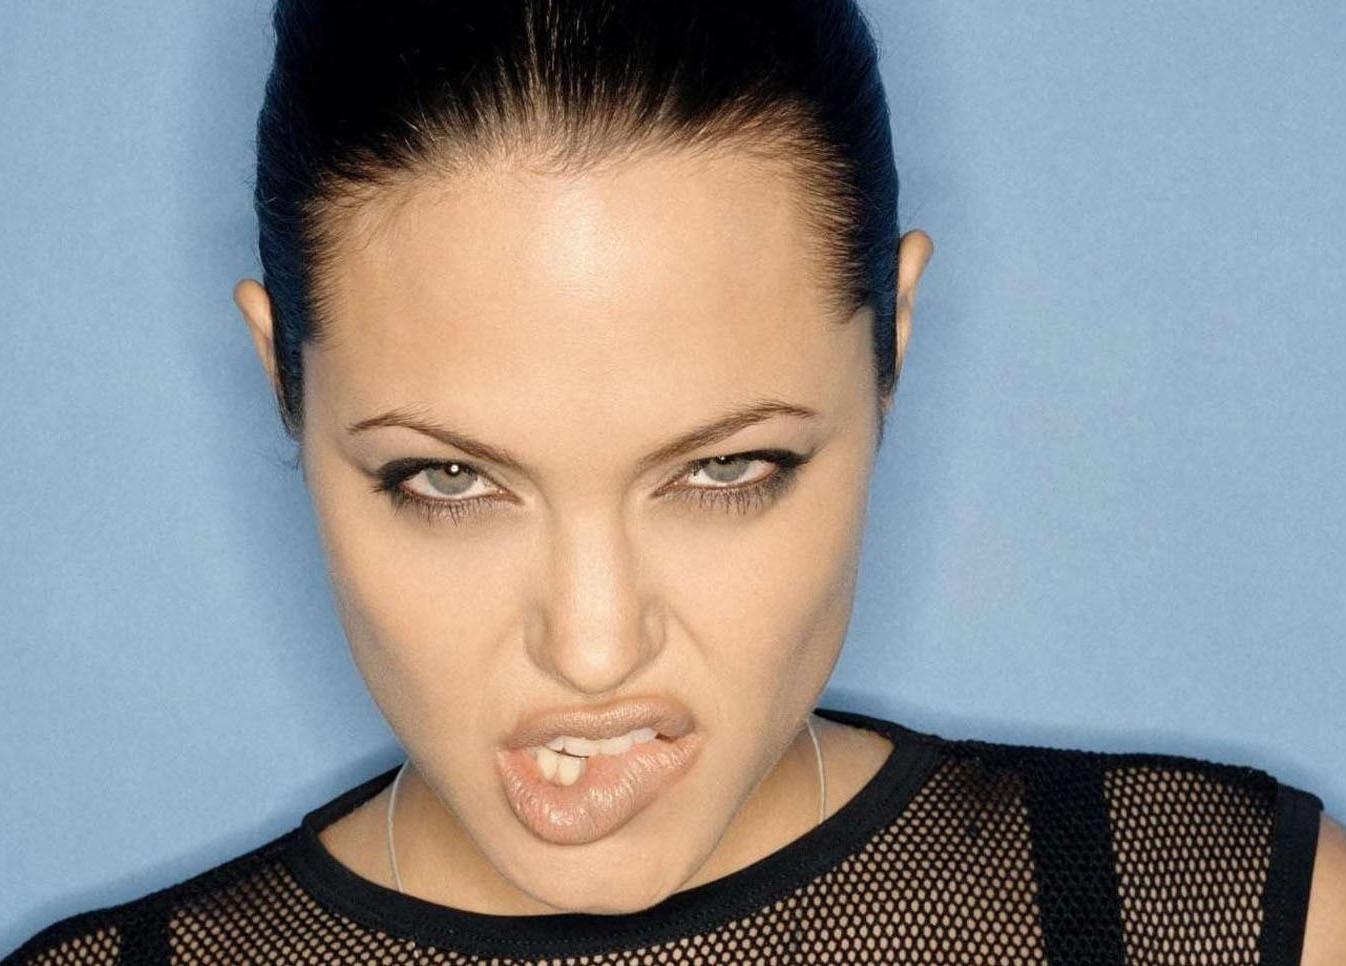 Angelina Jolie biting her lips